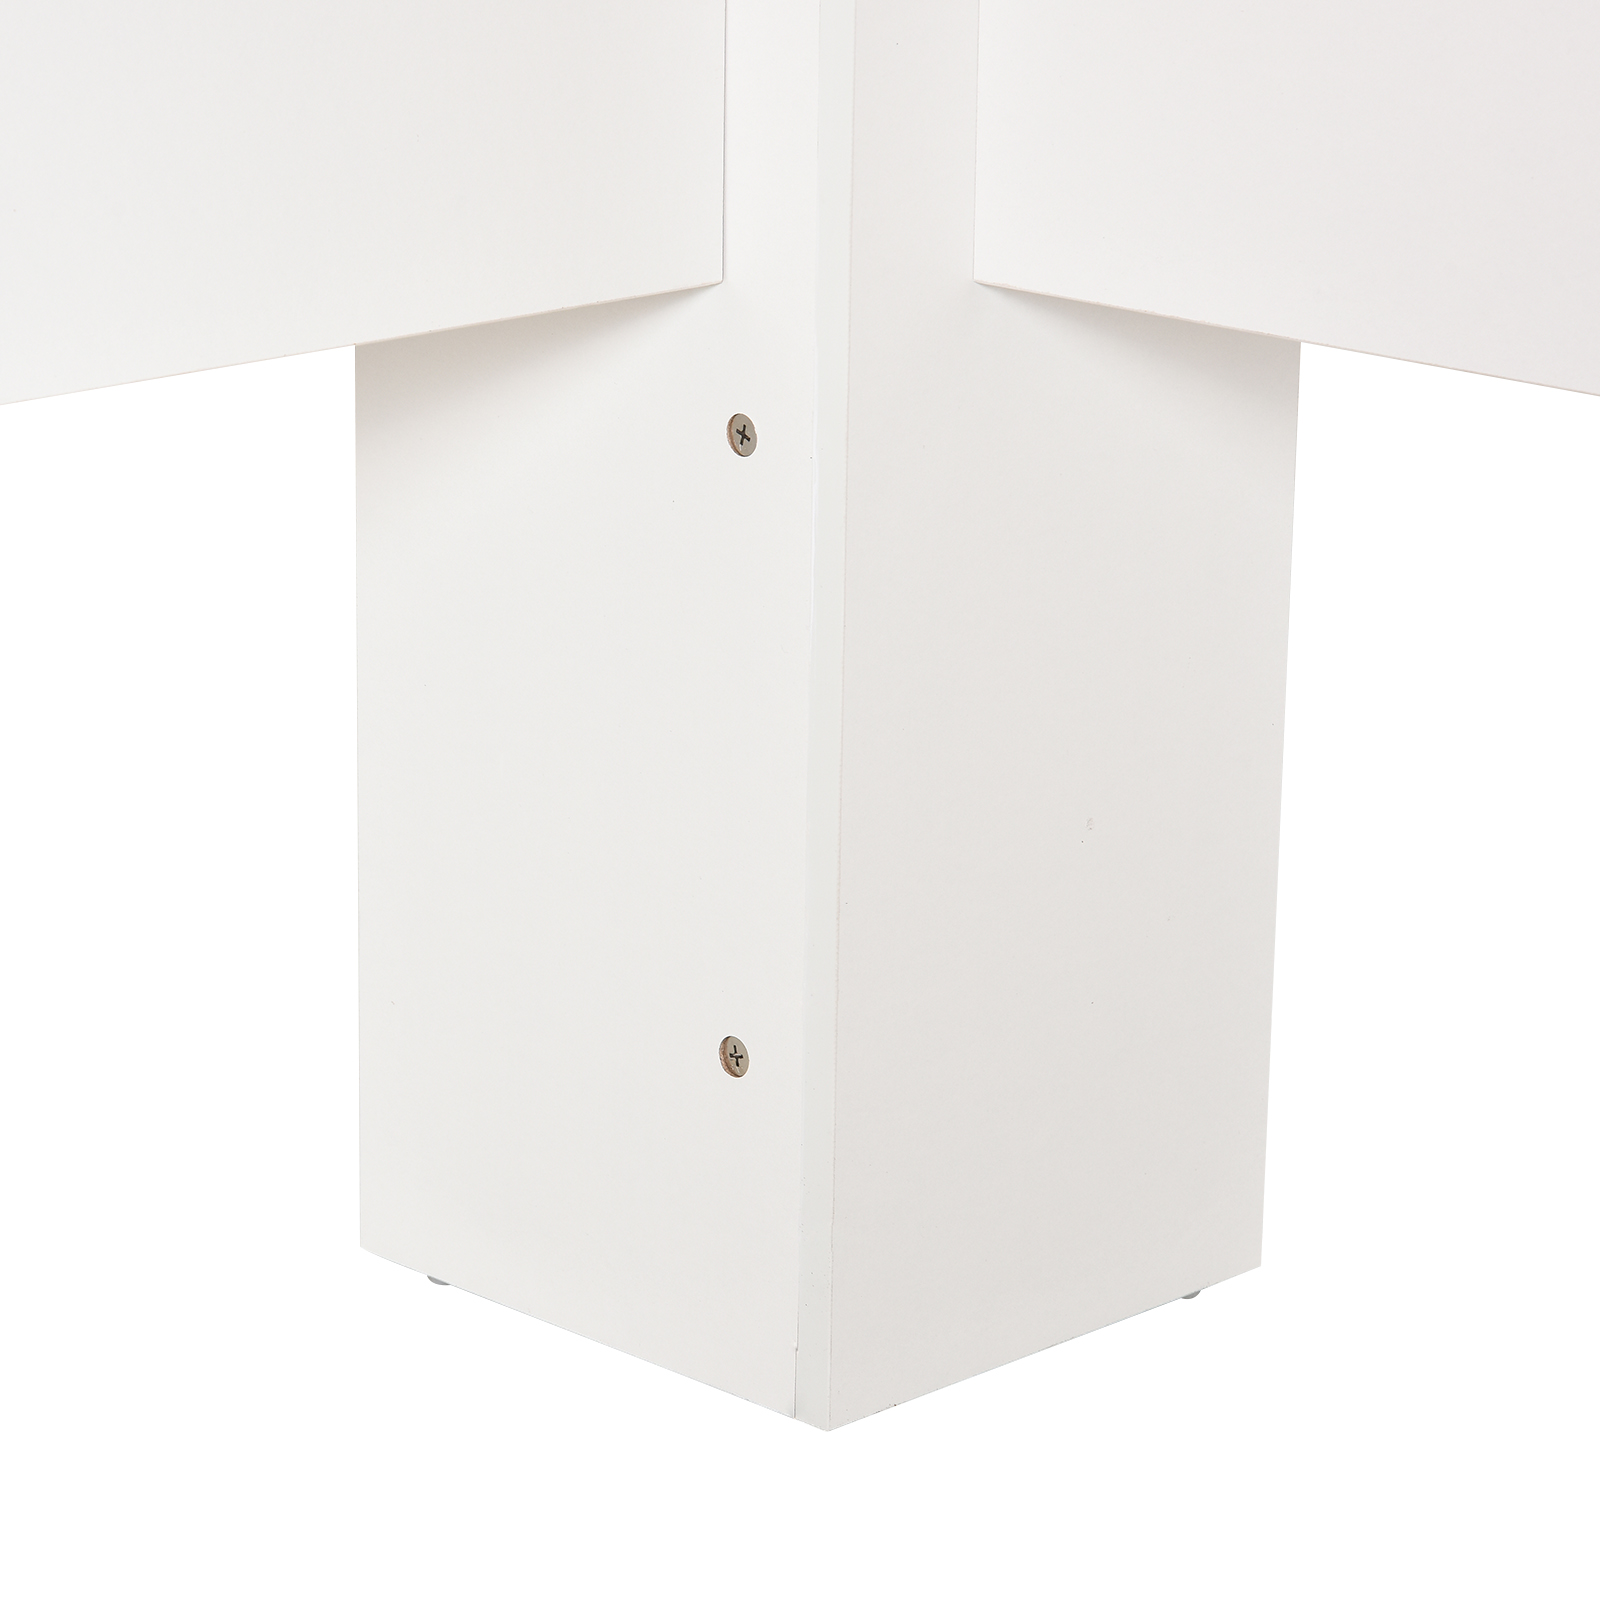 Mesa-de-Ordenador-PC-Escritorio-para-Oficina-Hogar-Esquinera-Forma-L-Madera miniatura 19